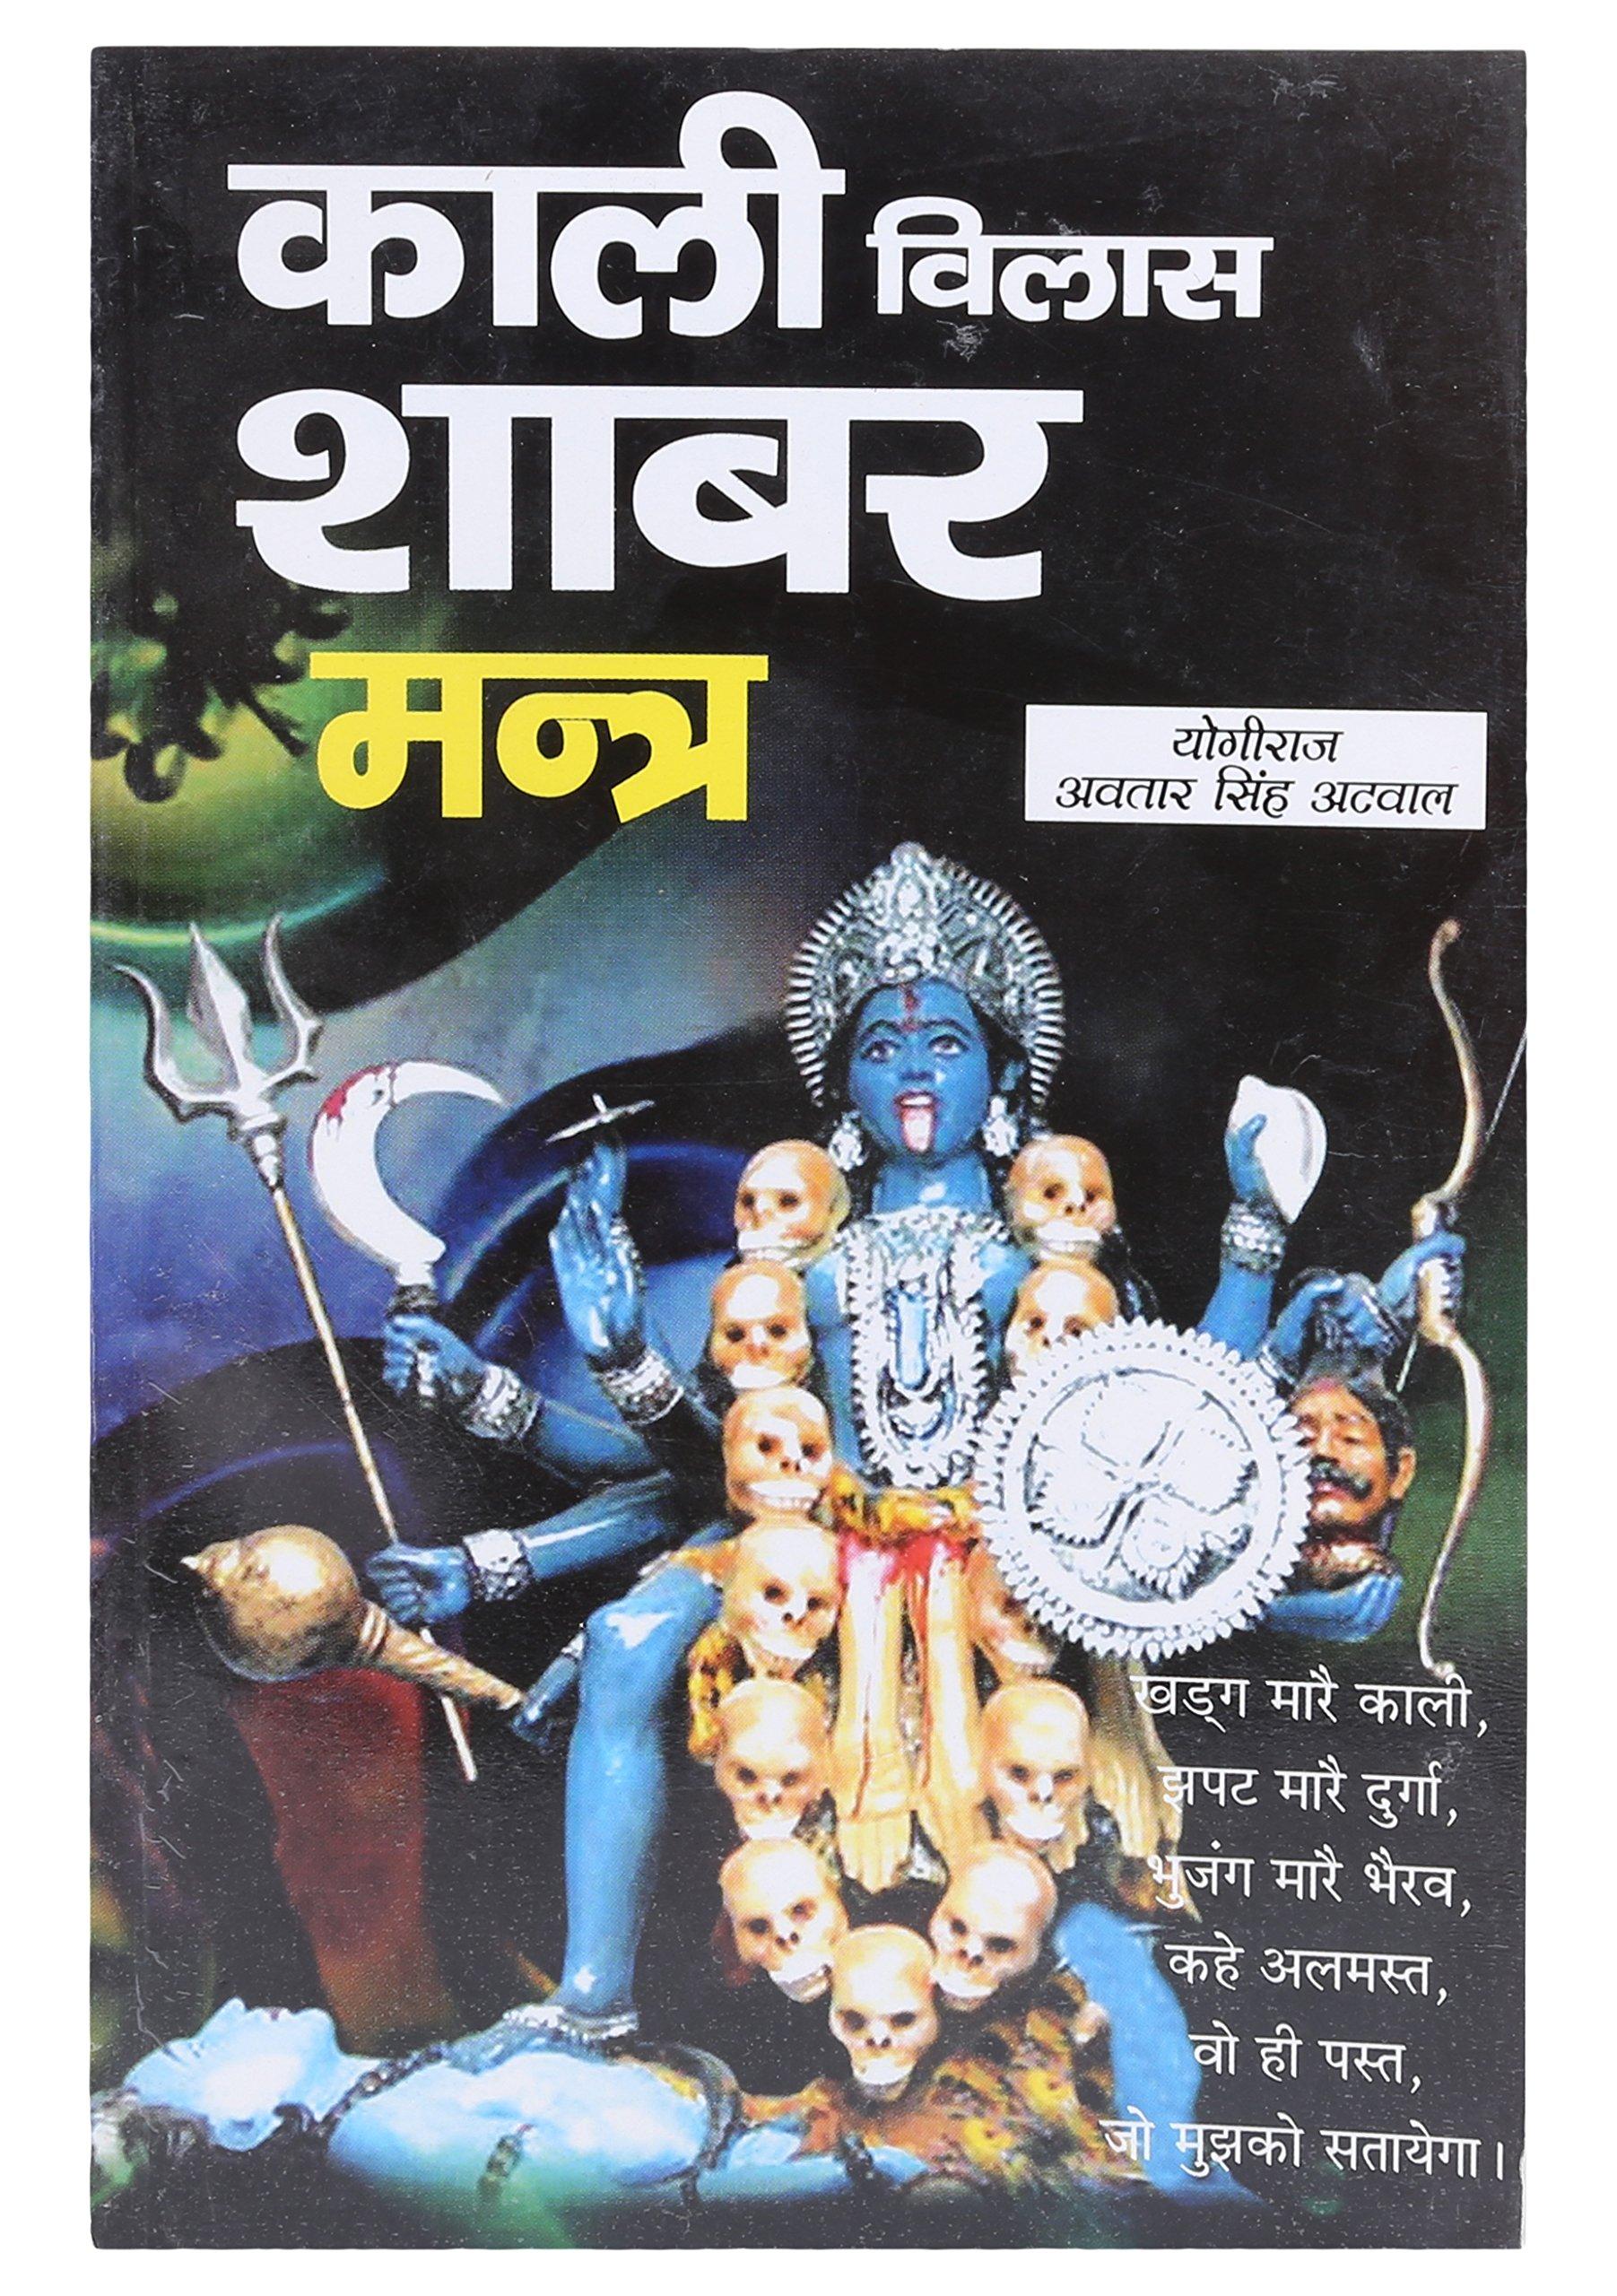 Free hindi mantra ebook download in shabar